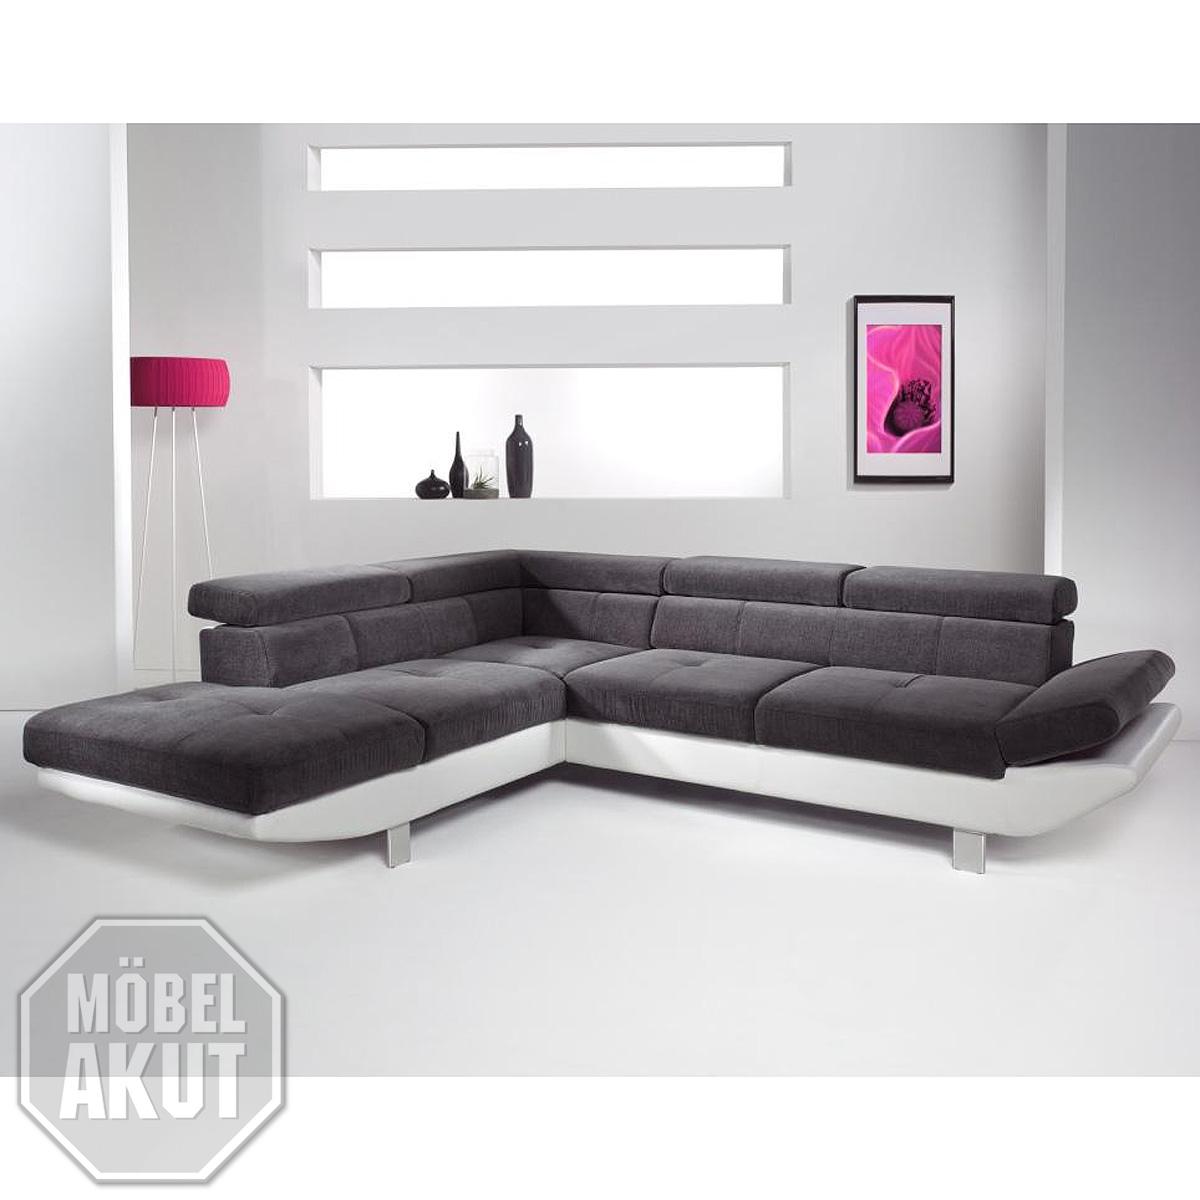 wohnlandschaft whisper ecksofa relaxfunktion wei anthrazit auswahl rechts links ebay. Black Bedroom Furniture Sets. Home Design Ideas